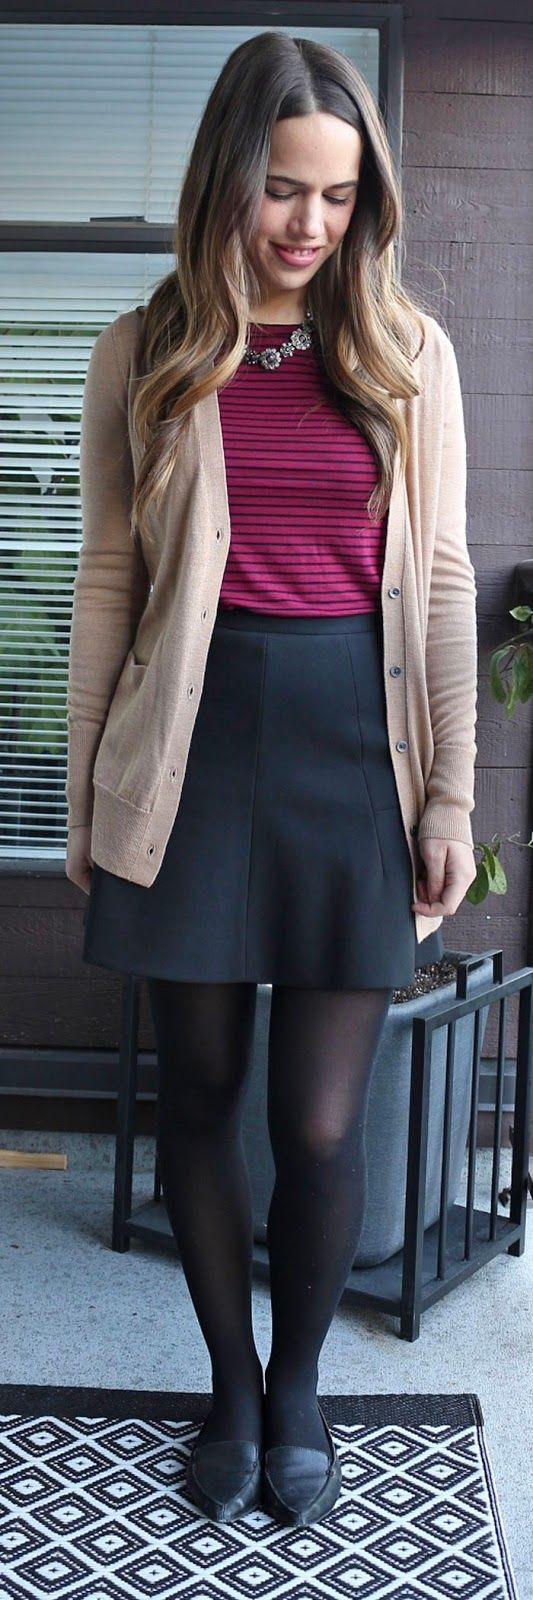 "business casual teacher teaching outfit | Jules in Flats -- Gap Merino Cardigan, Old Navy Crew Neck Layering Tee, J.Crew Skirt"""